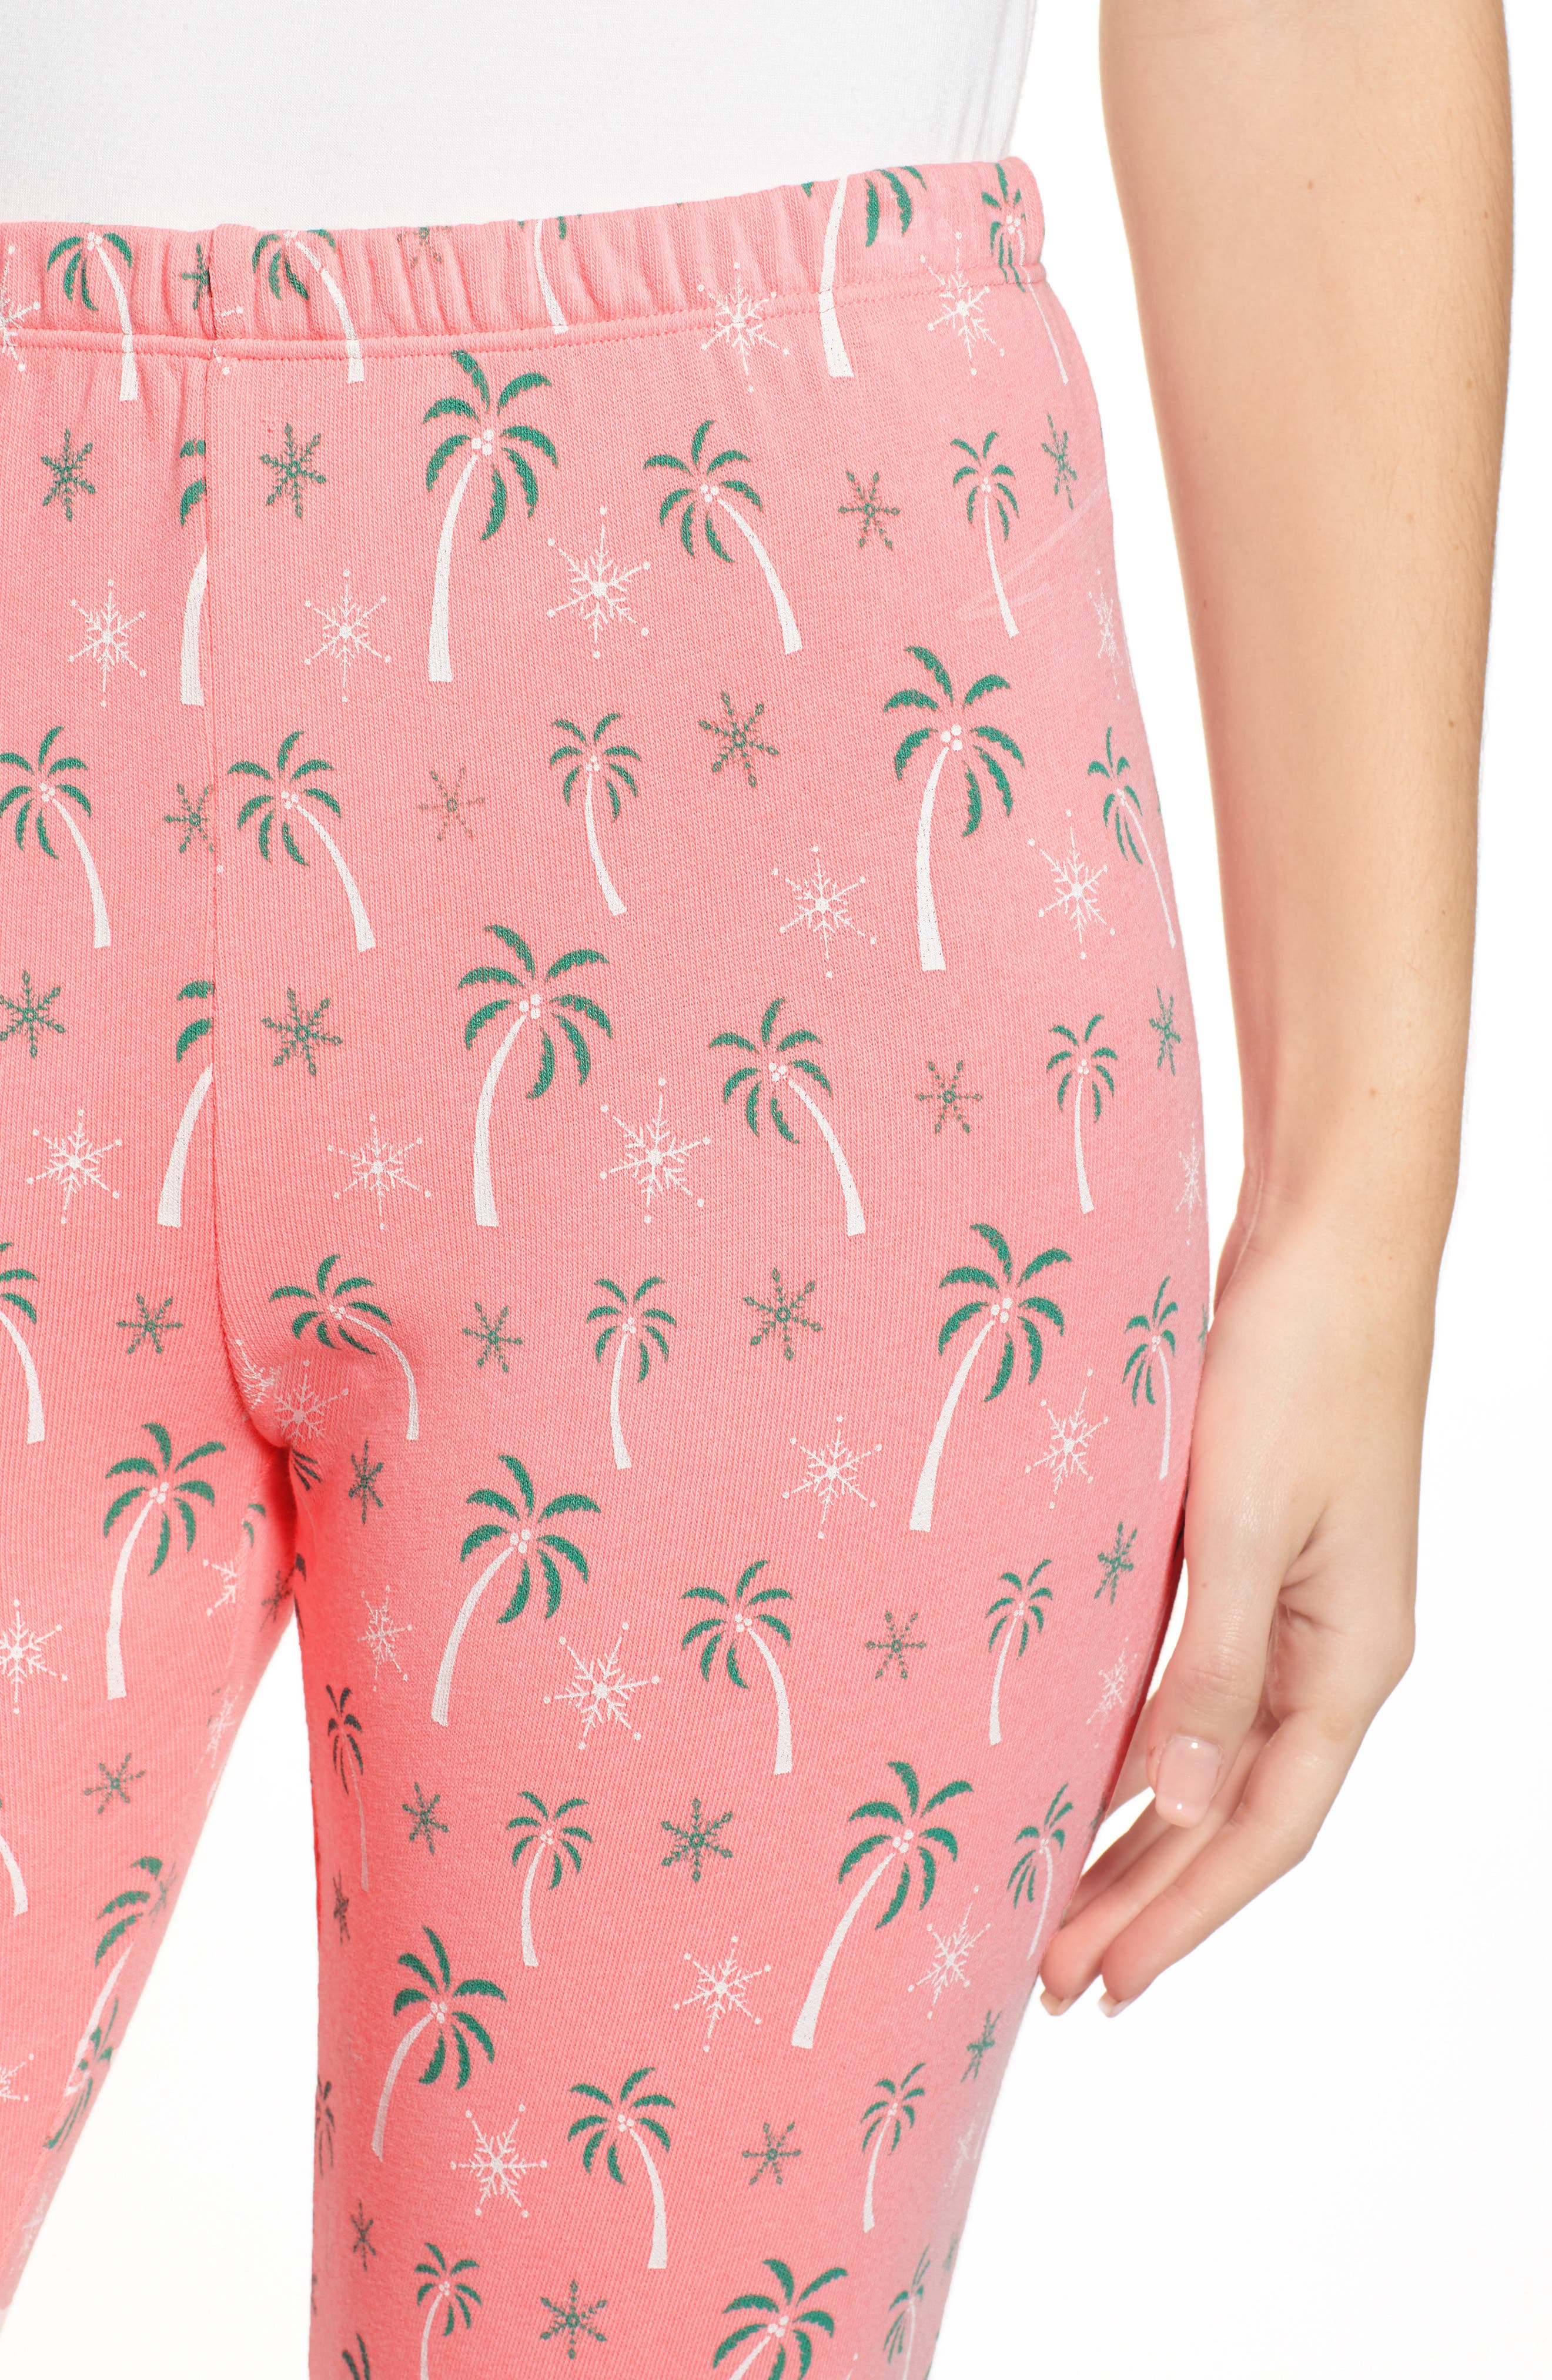 Tropical Christmas Sweatpants,                             Alternate thumbnail 4, color,                             NEON SIGN